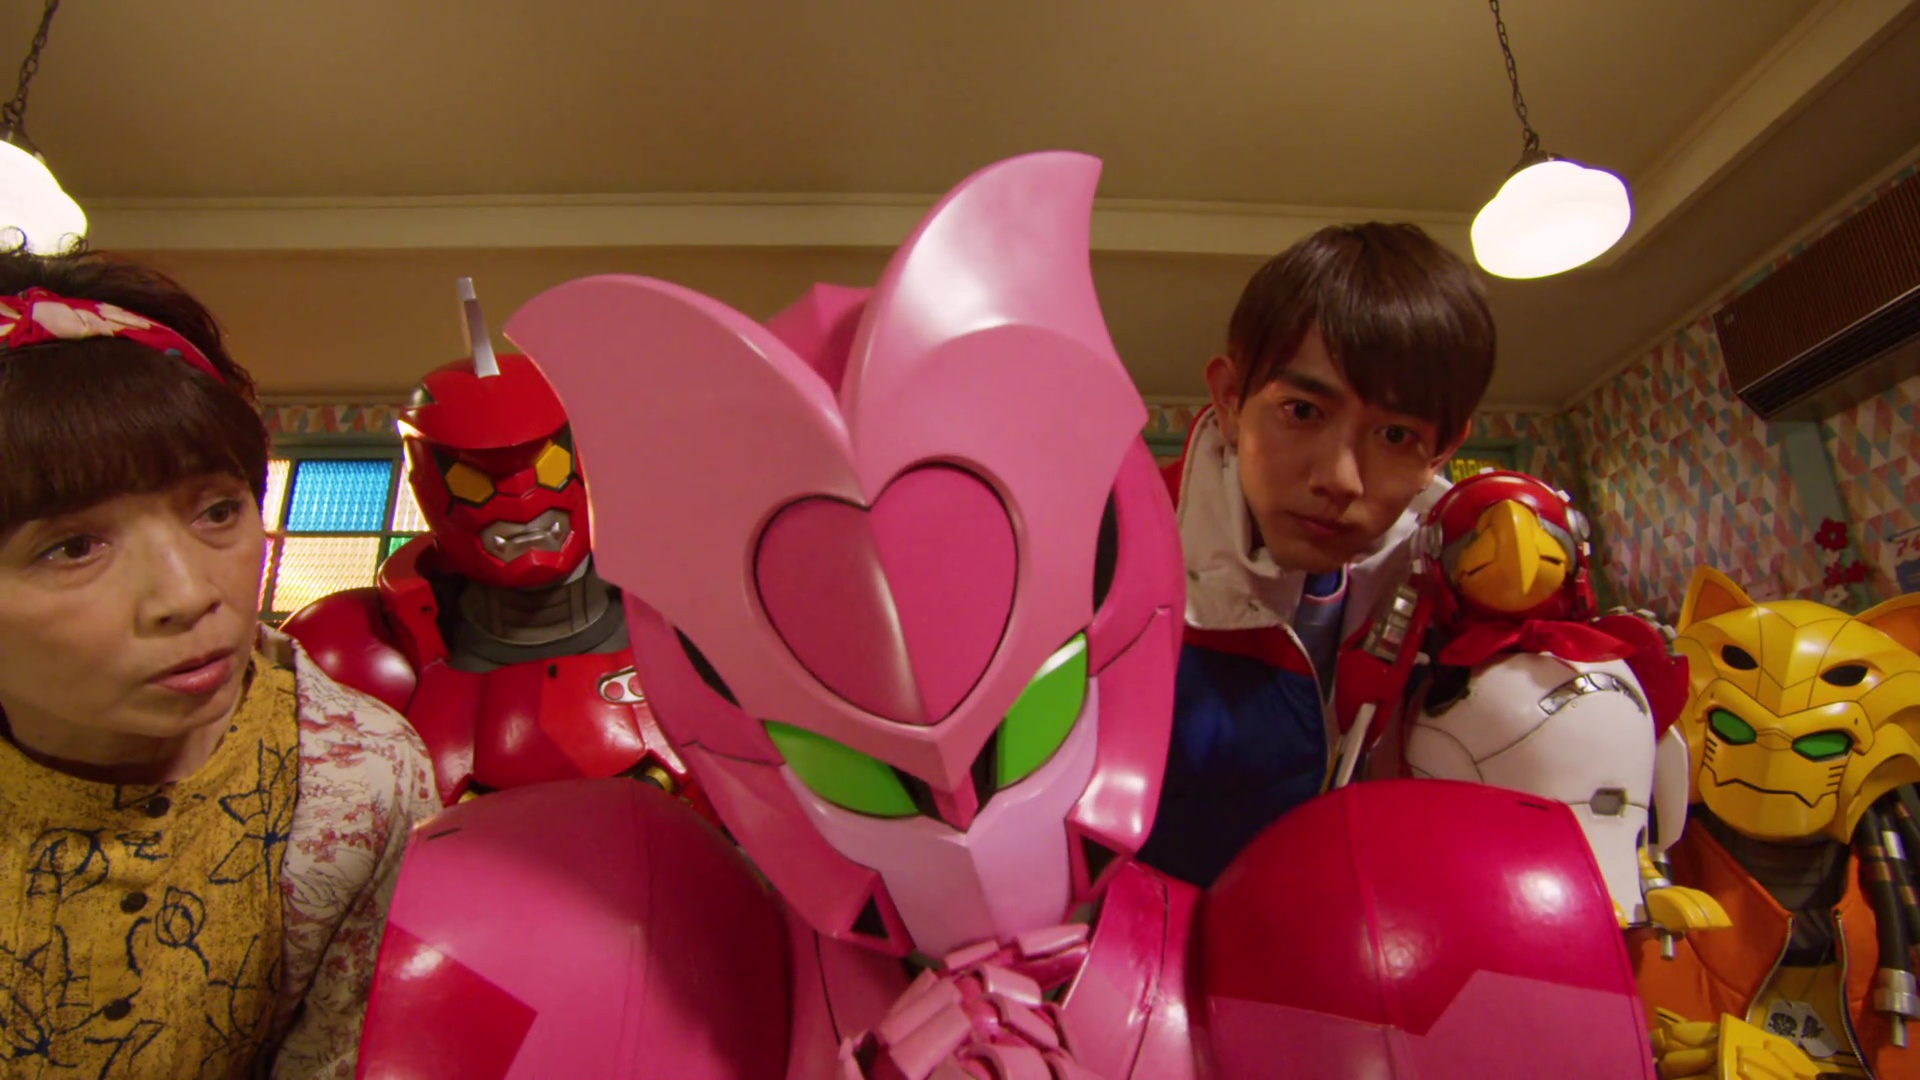 Kikai Sentai Zenkaiger Episode 3 Recap